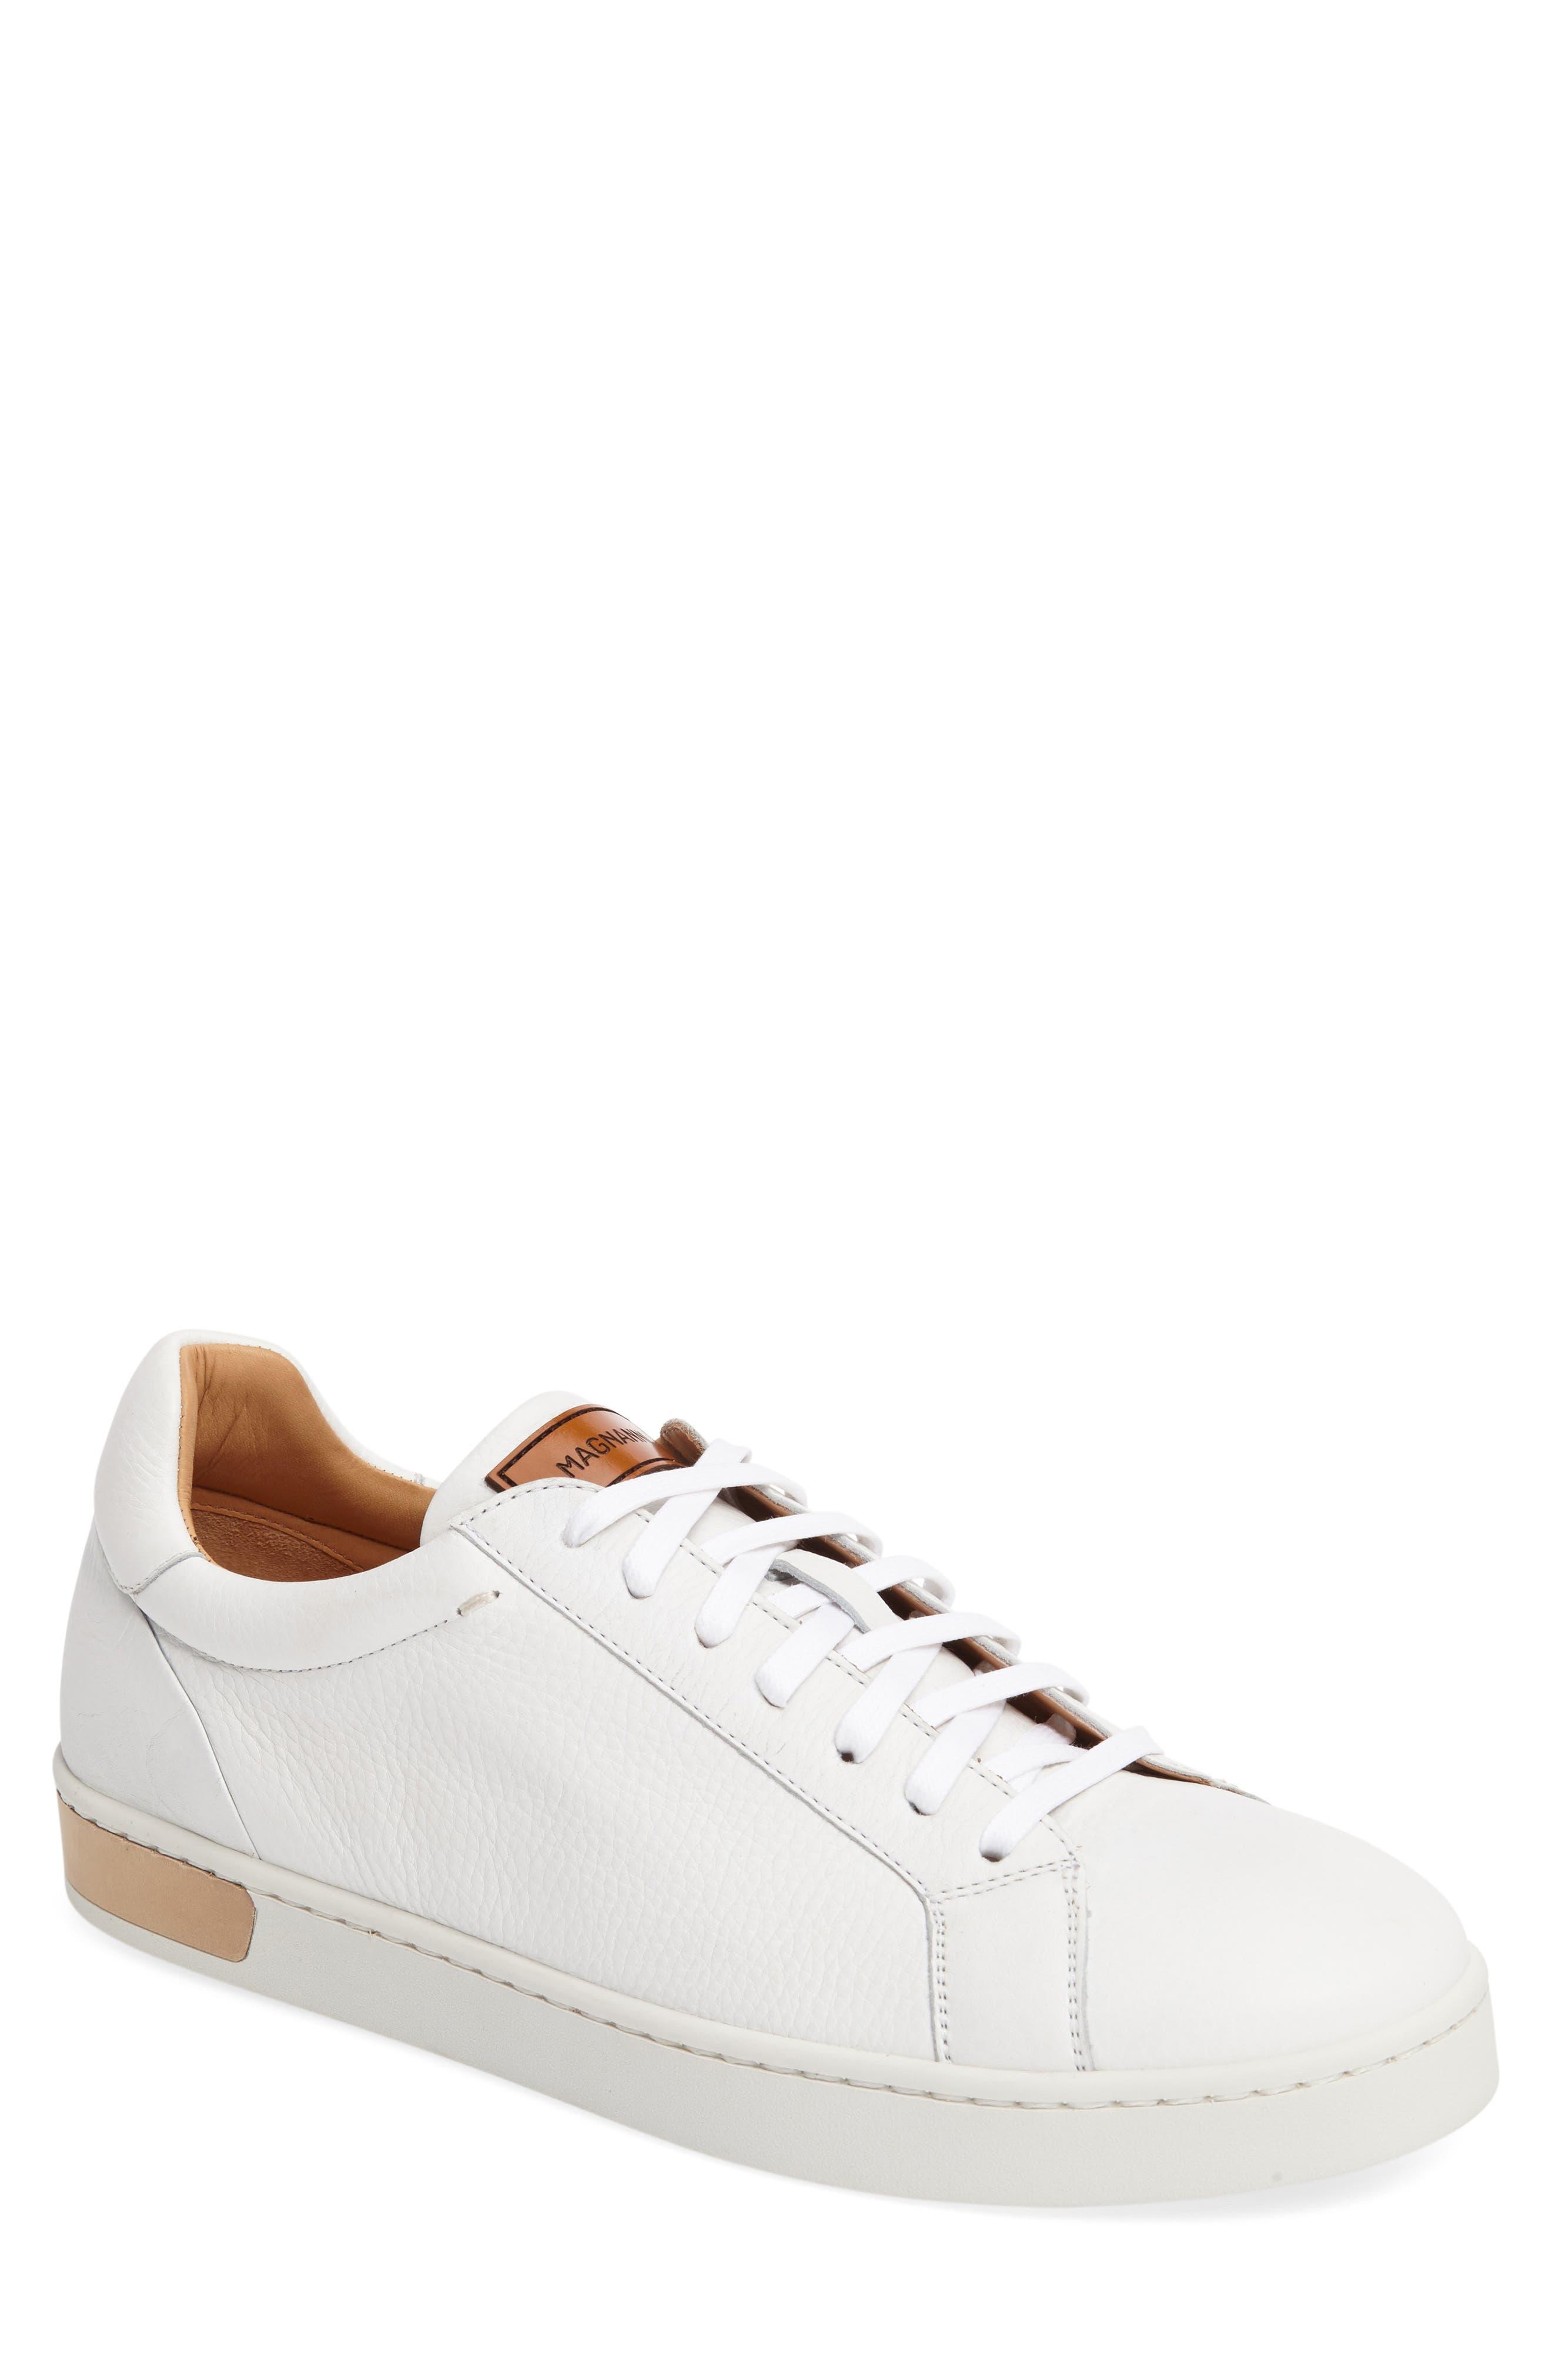 Caballero Sneaker,                         Main,                         color, White Leather